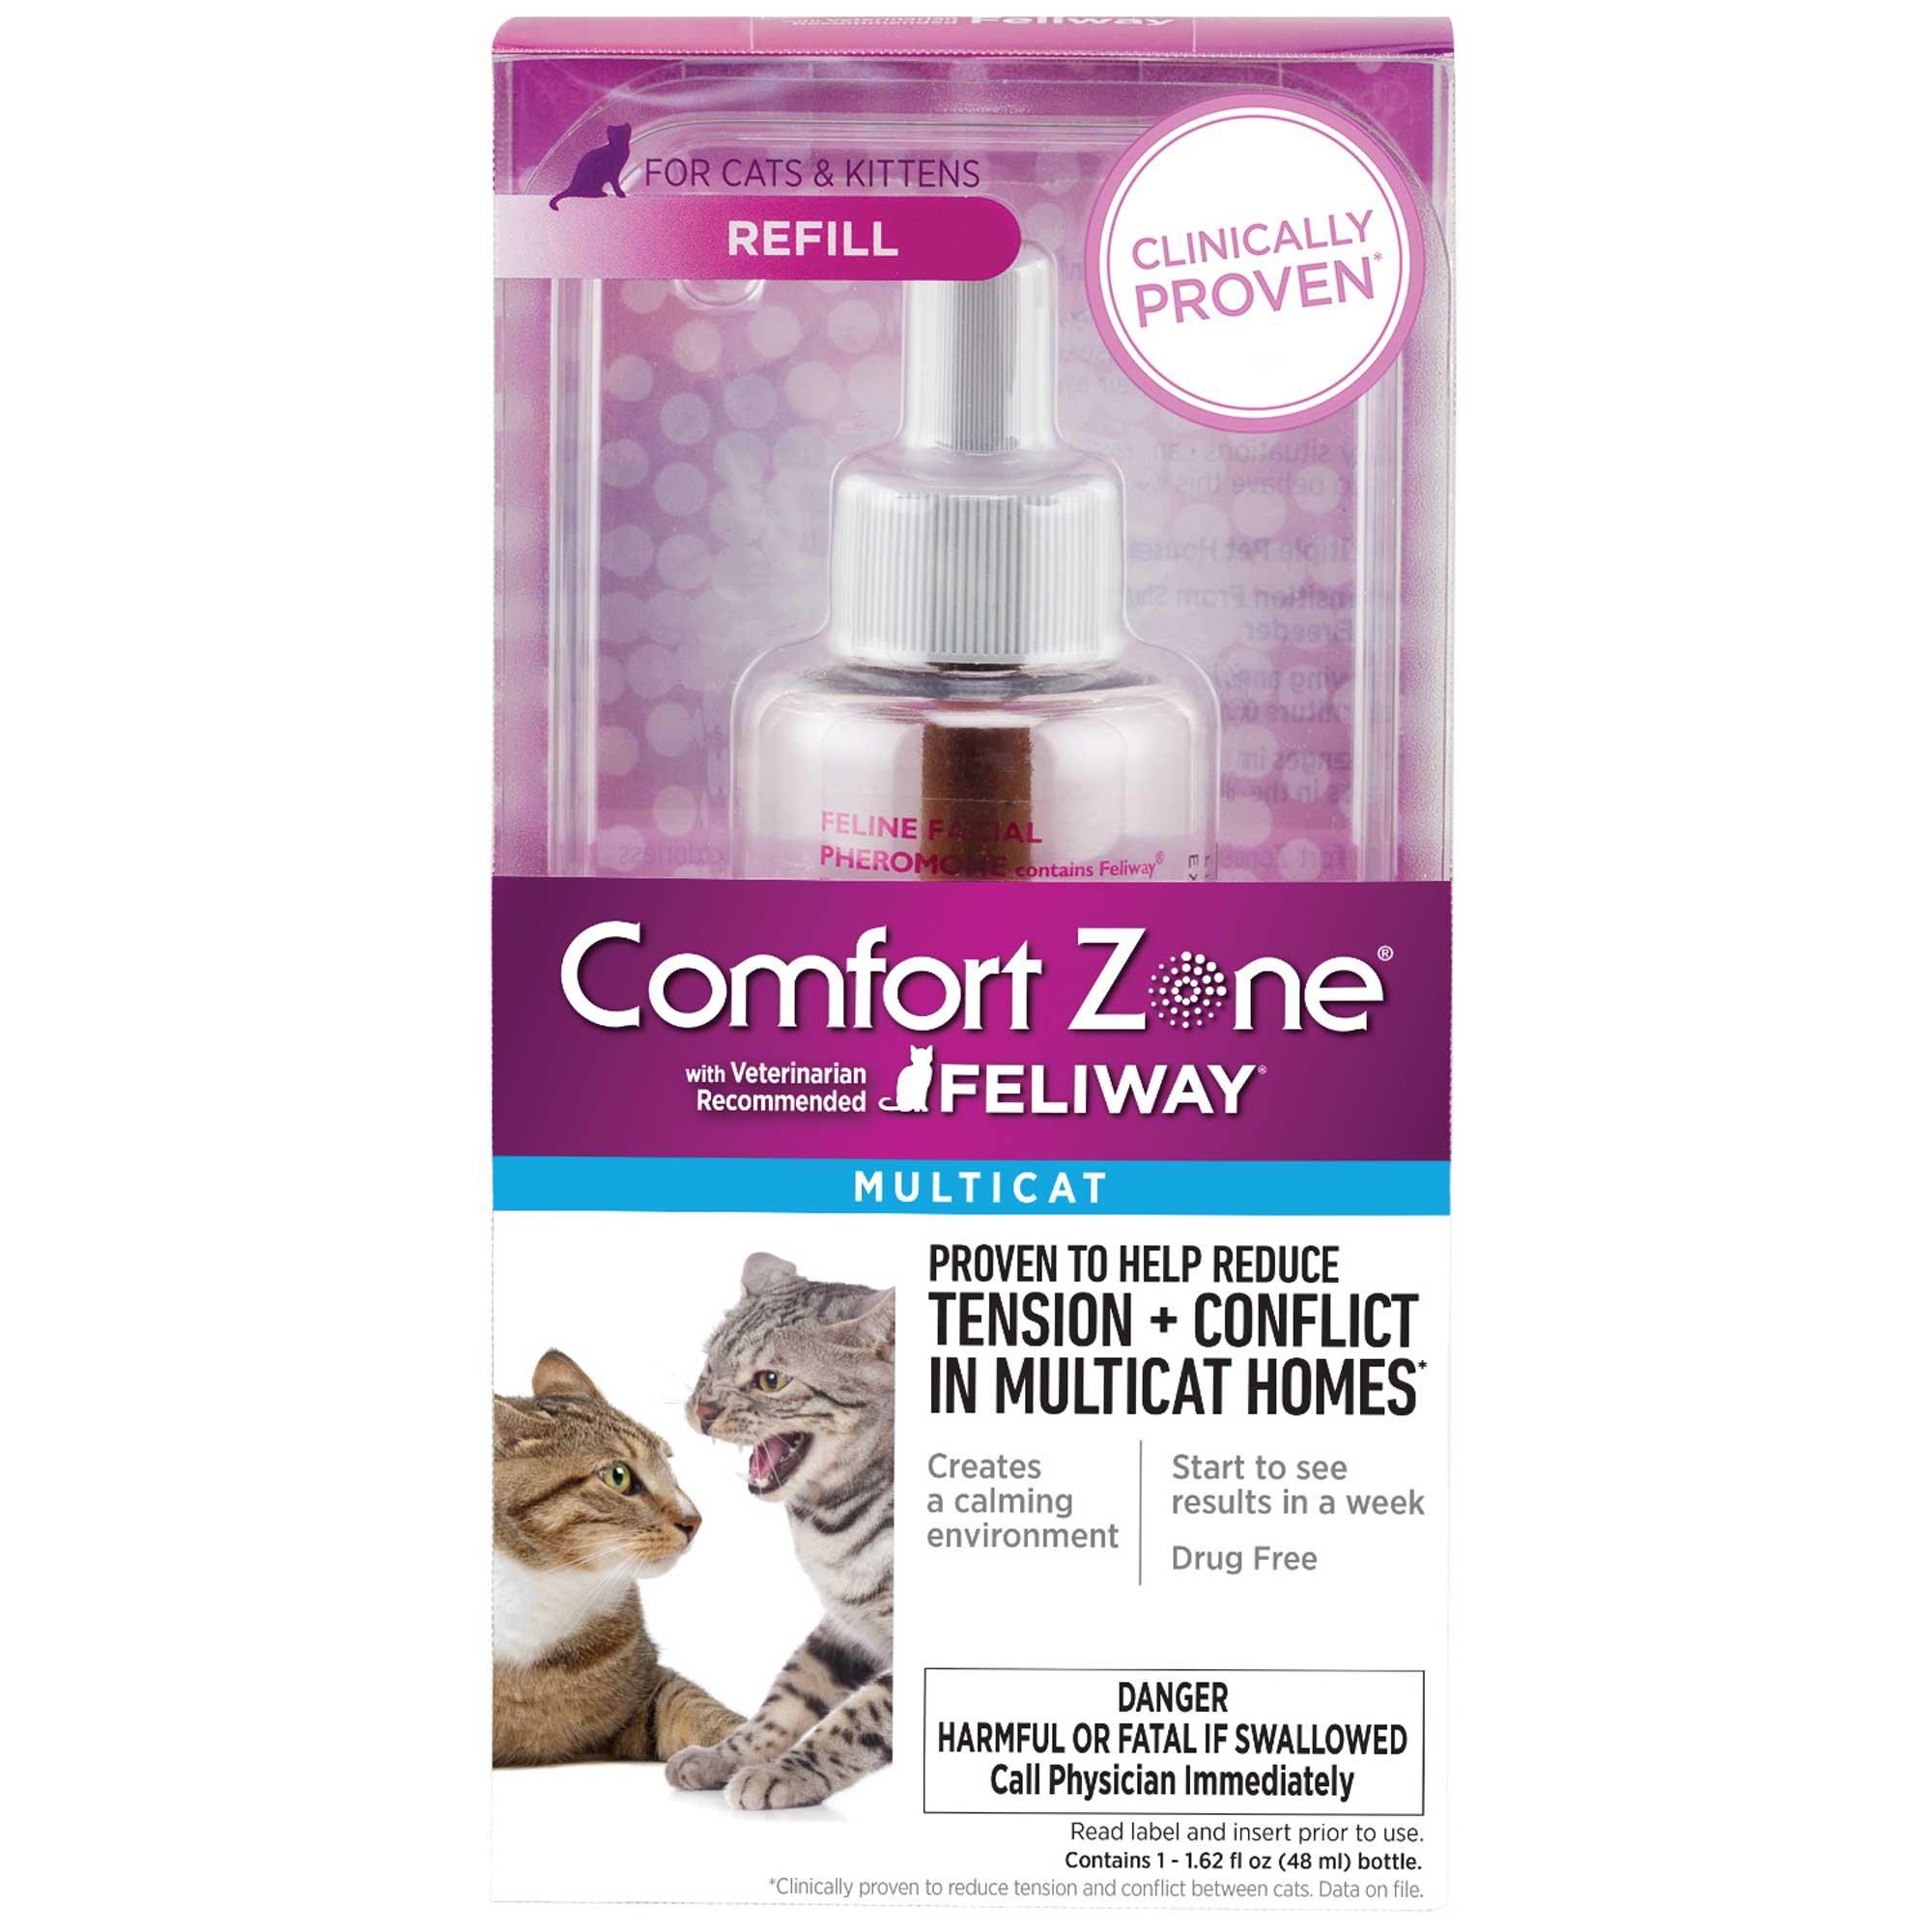 Comfort Zone Mulitcat Refill with Feliway